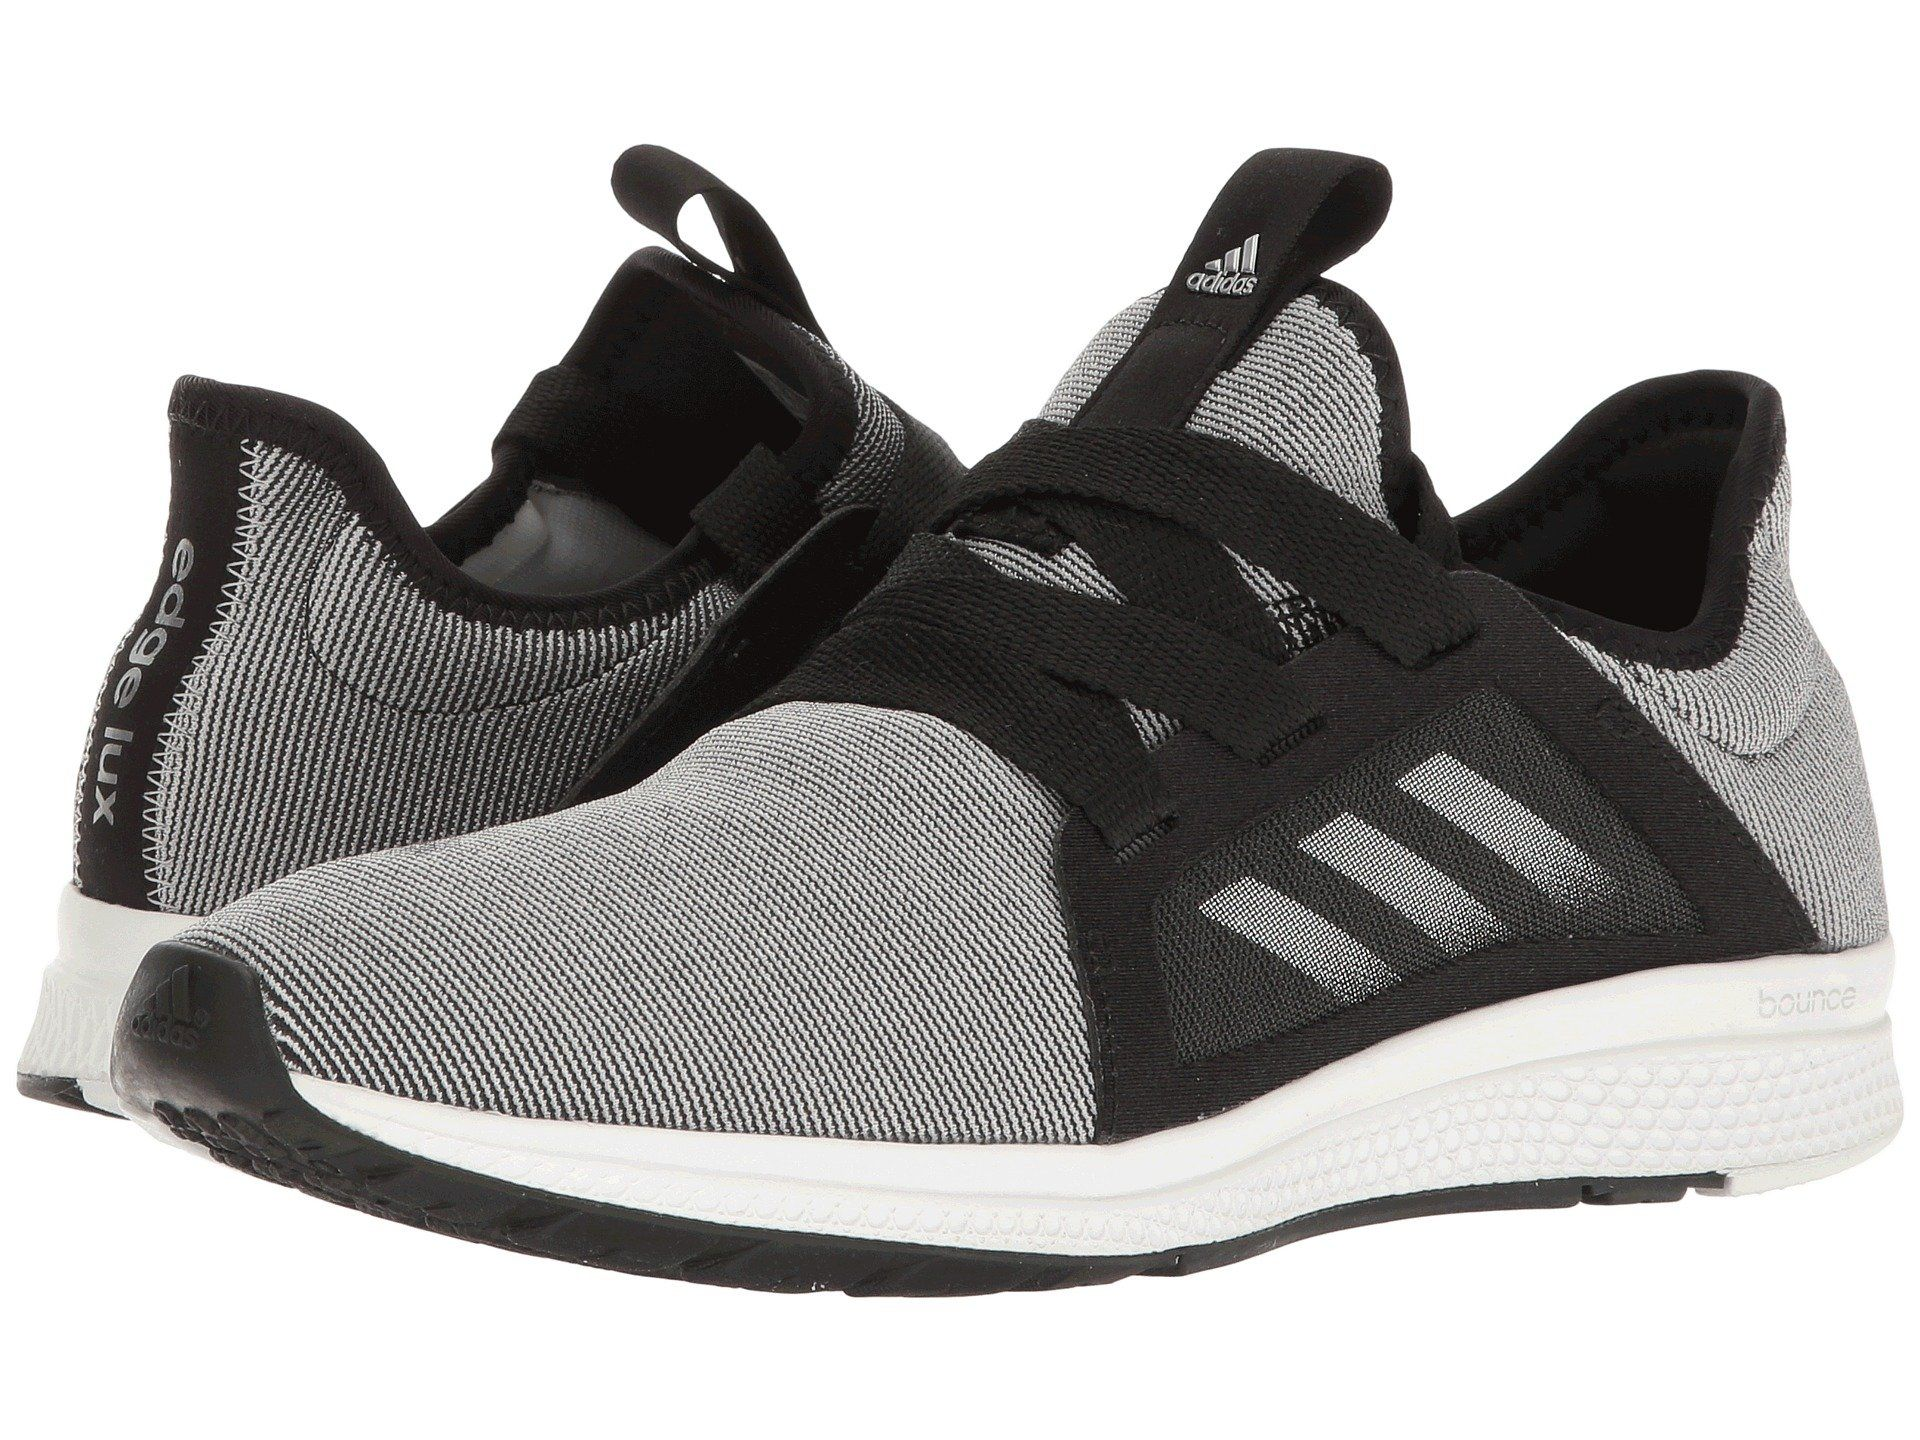 adidas adidas edge lux & scarpe da ginnastica adidas scarpe da ginnastica